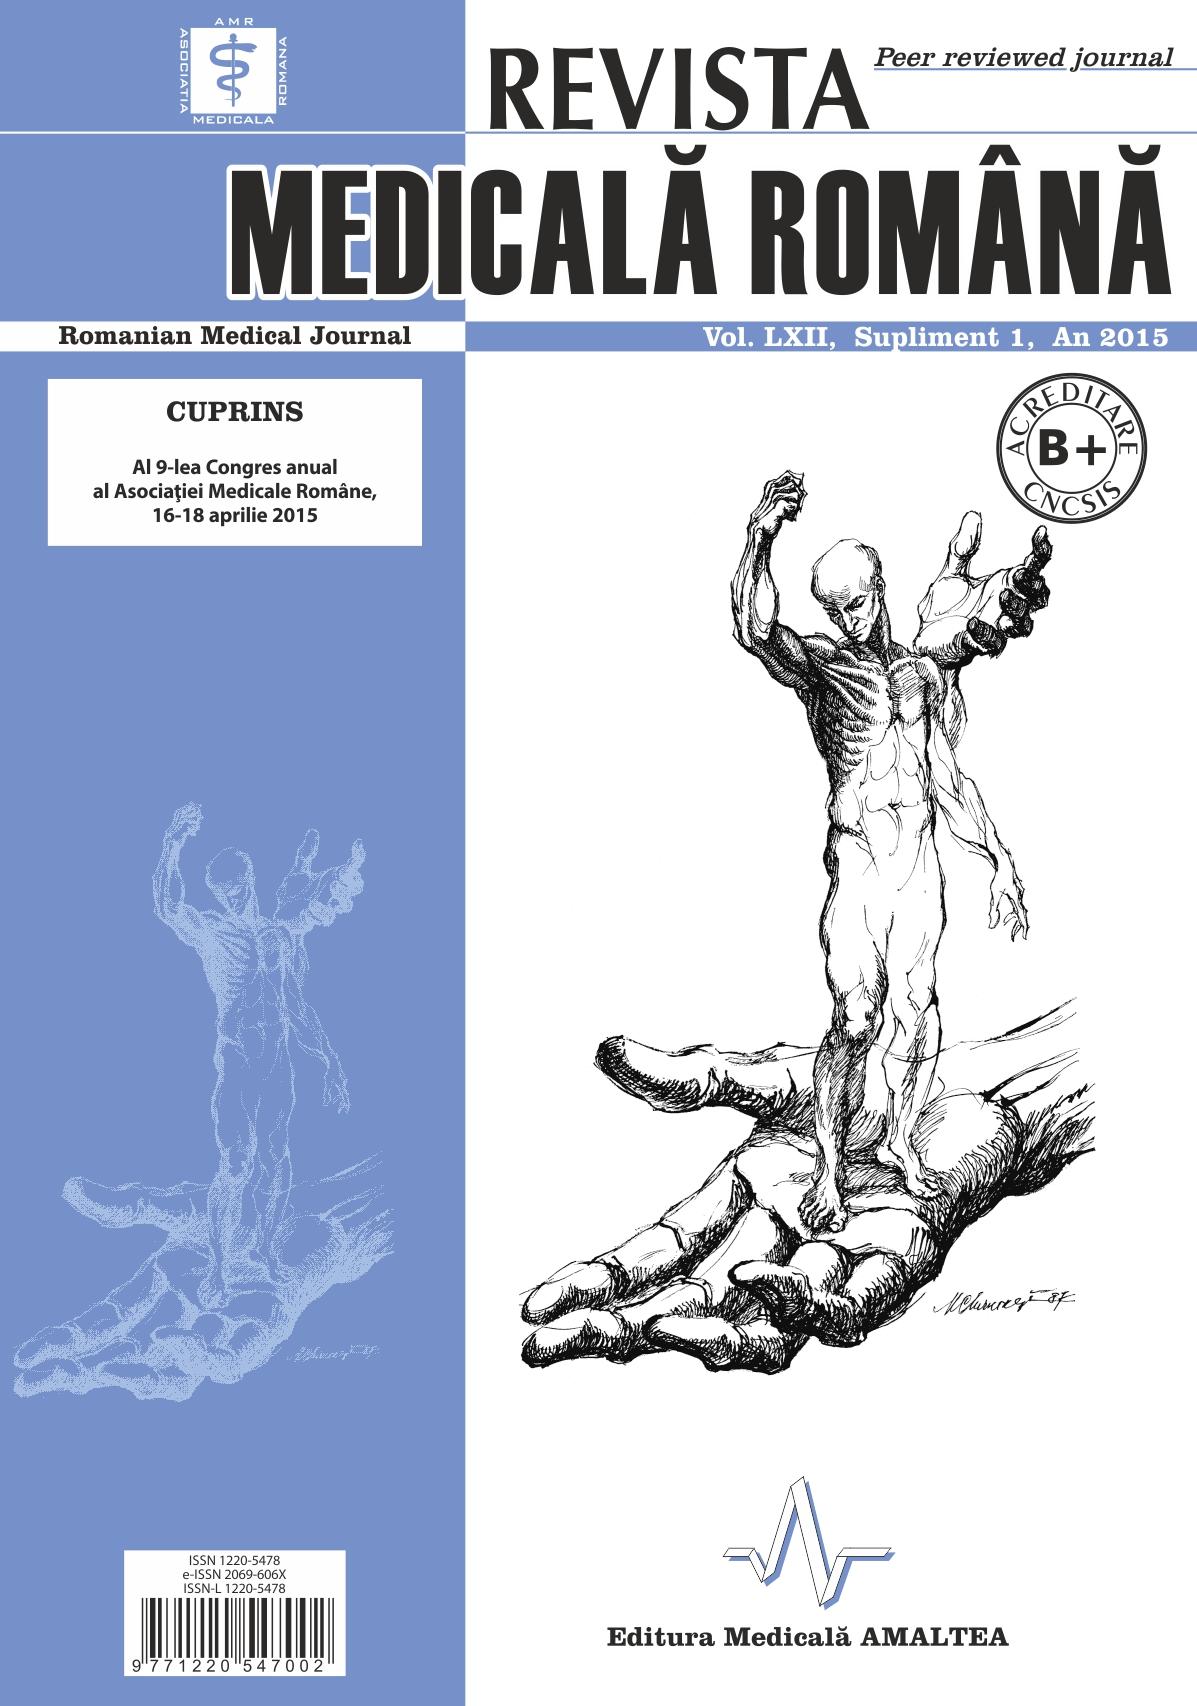 REVISTA MEDICALA ROMANA - Romanian Medical Journal, Vol. LXII, Supliment, An 2015